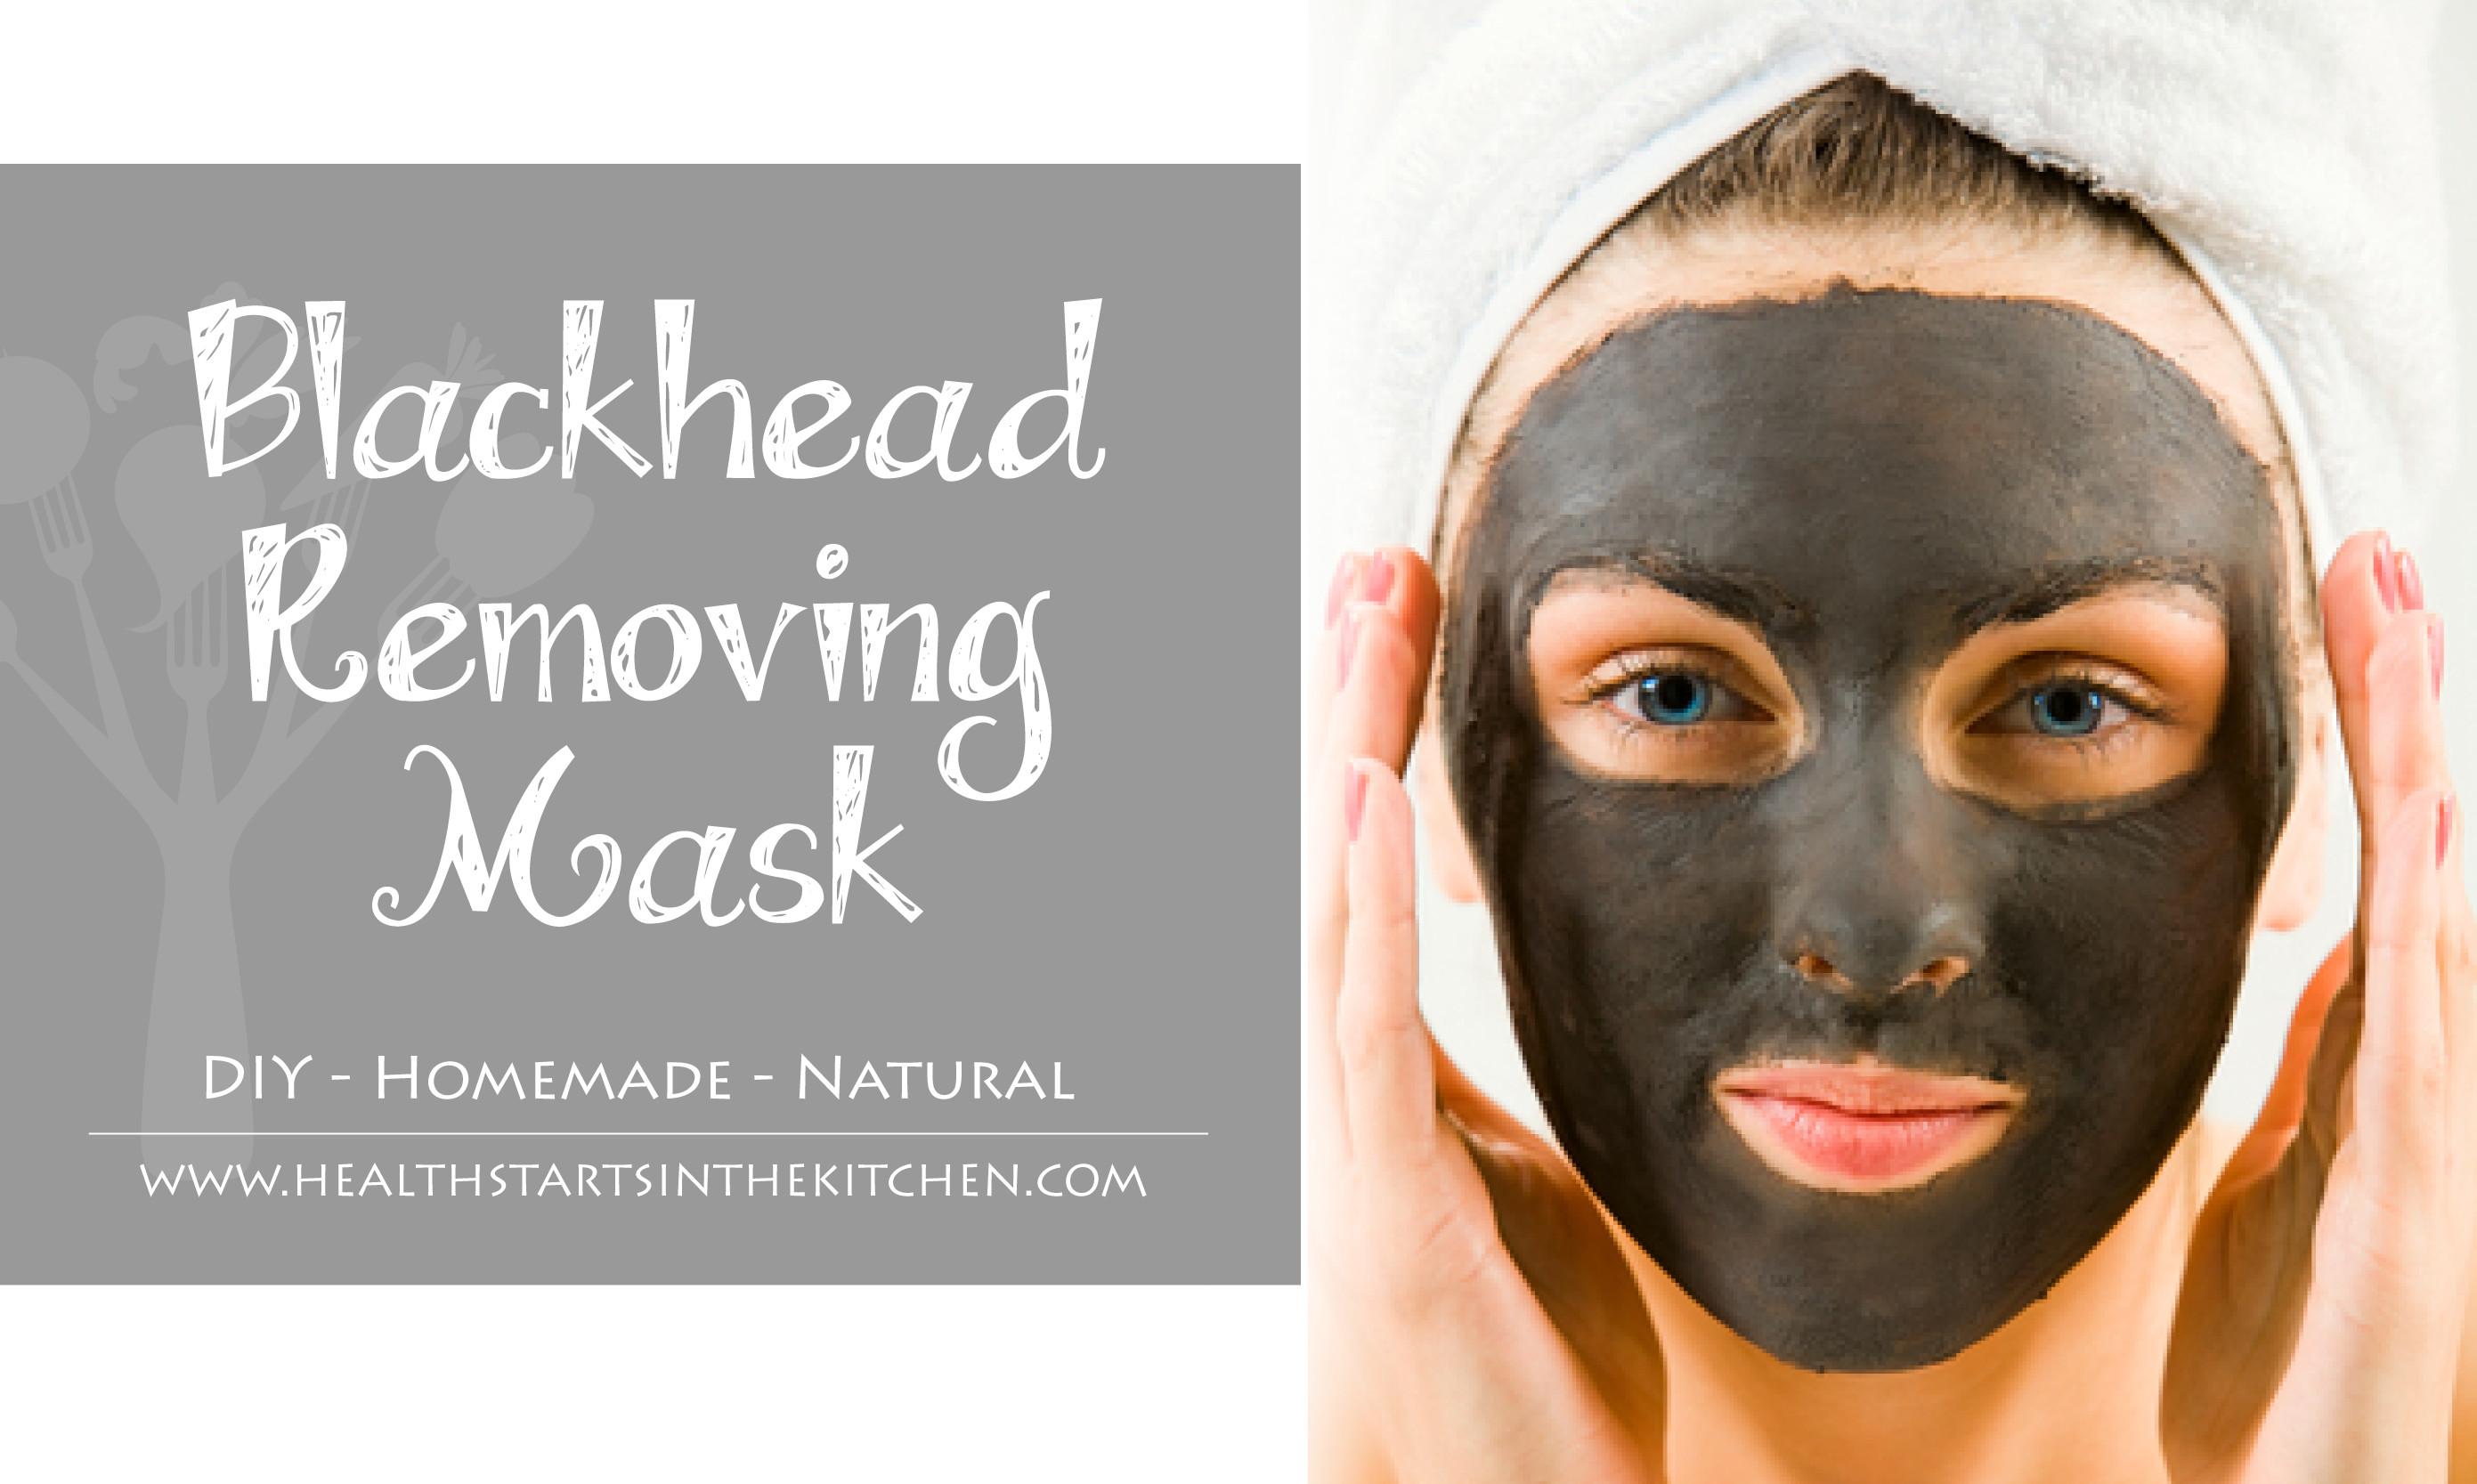 Blackhead Maske Diy  DIY Homemade Blackhead Removing Mask Health Starts in